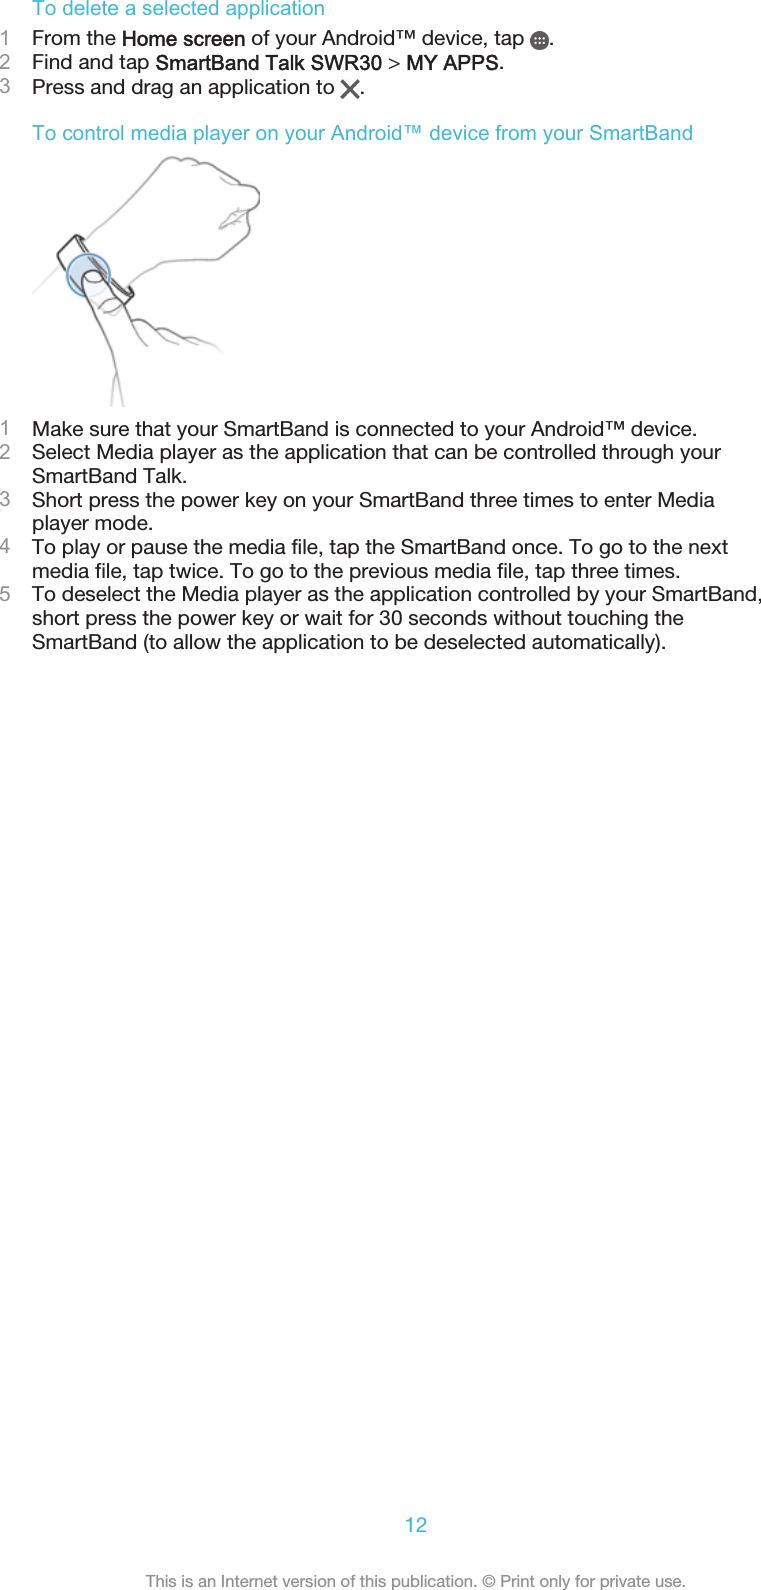 user-manual-fitpro-smartband.pdf